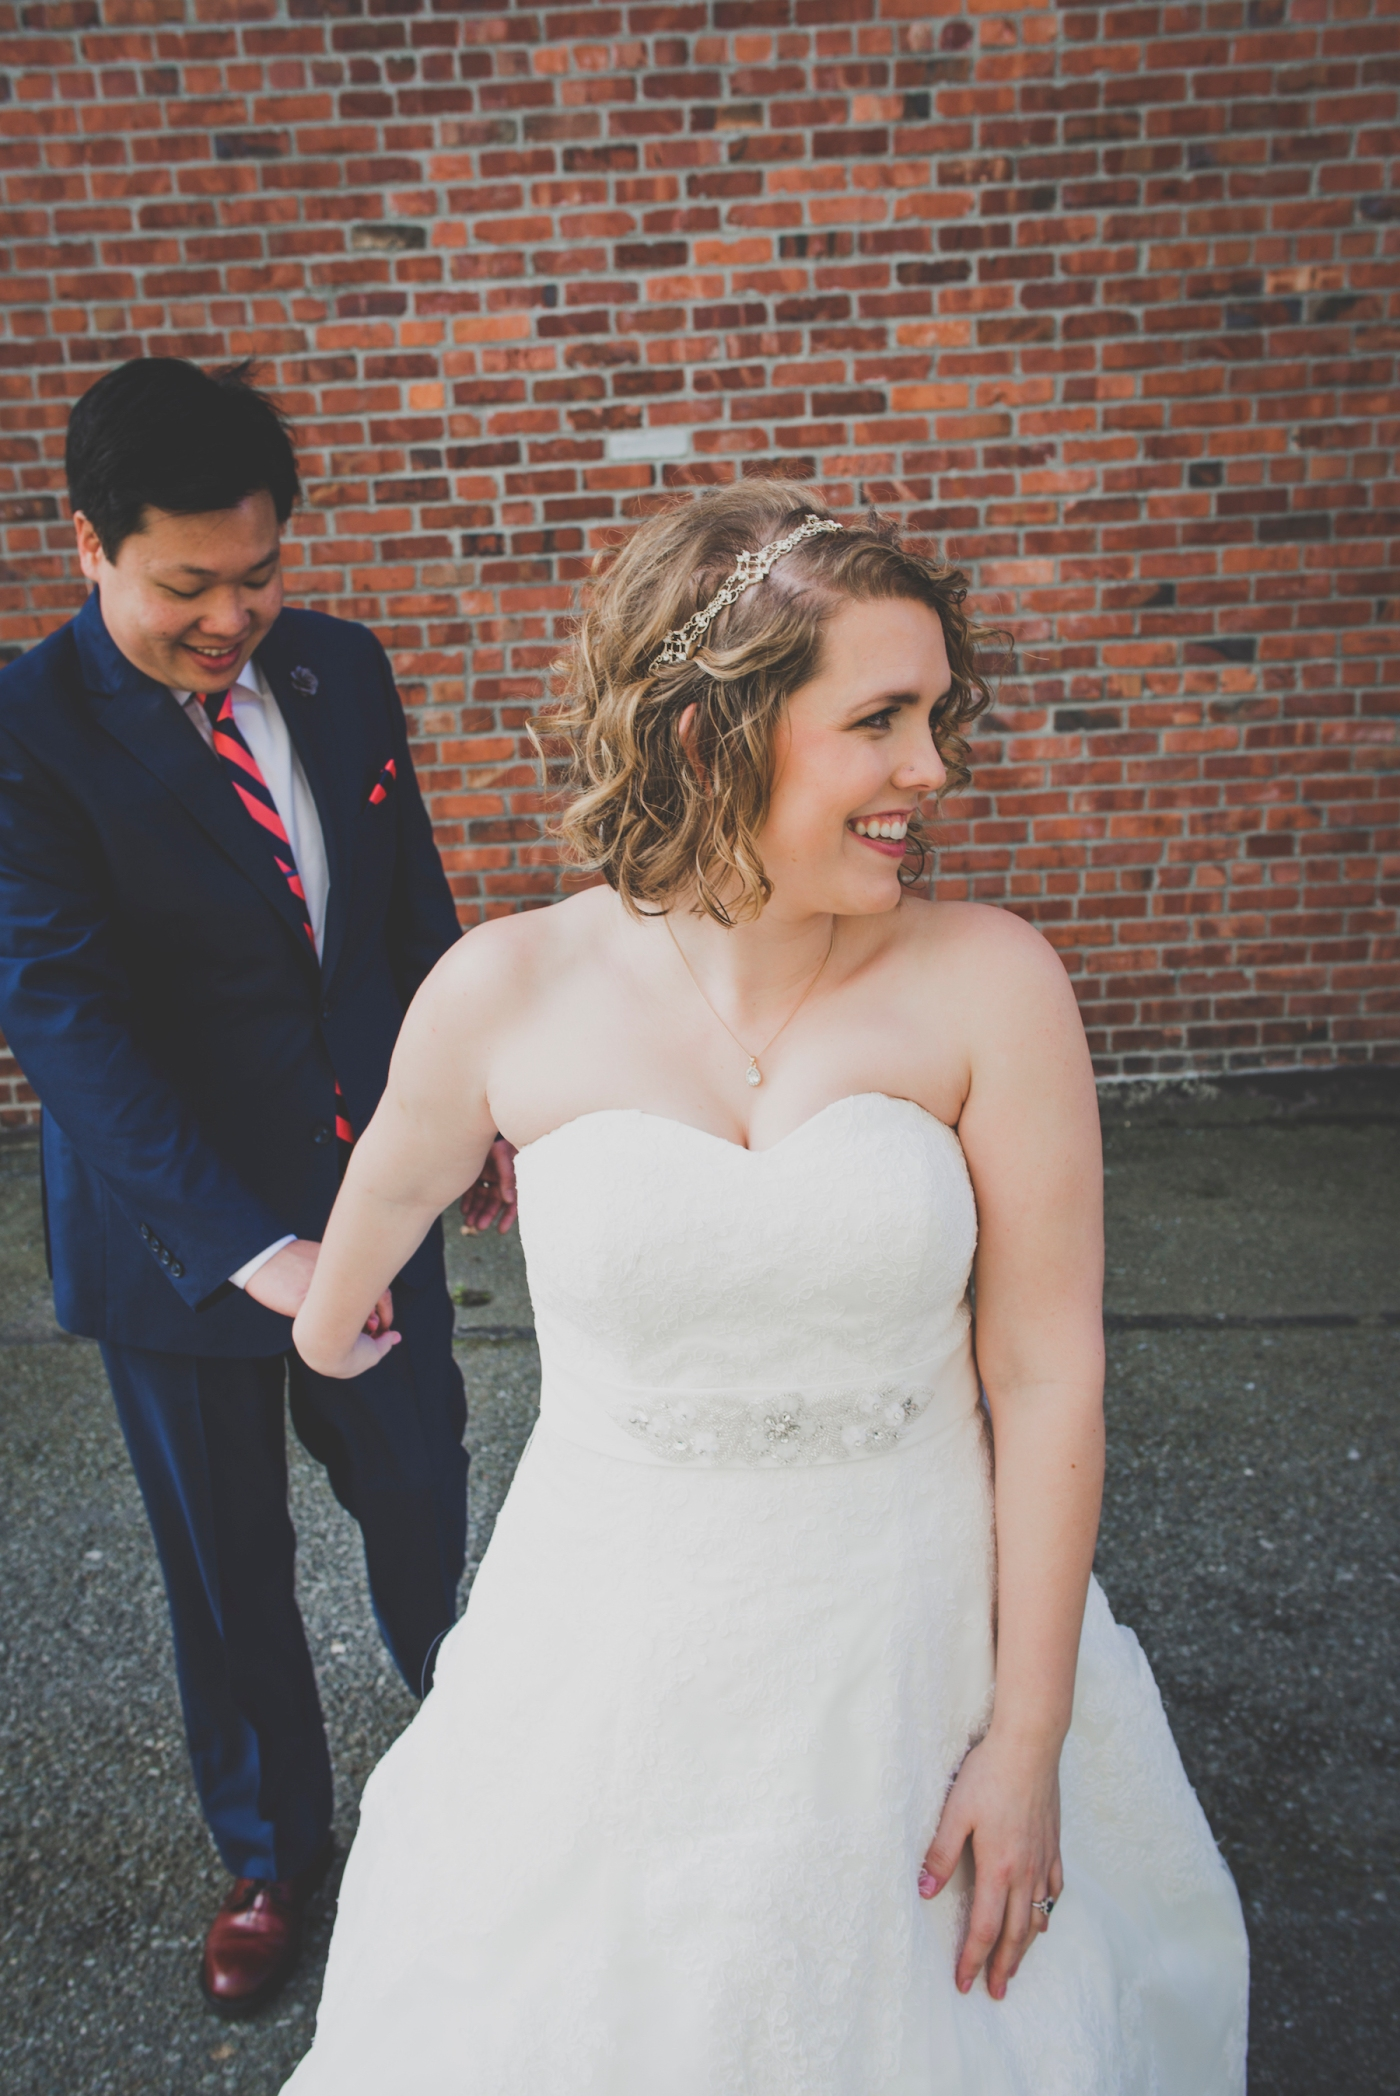 DSC_2140Everett_Wedding_Ballroom_Jane_Speleers_photography_Rachel_and_Edmund_Bridesmaids_peach_dresses_groomsmen_2017